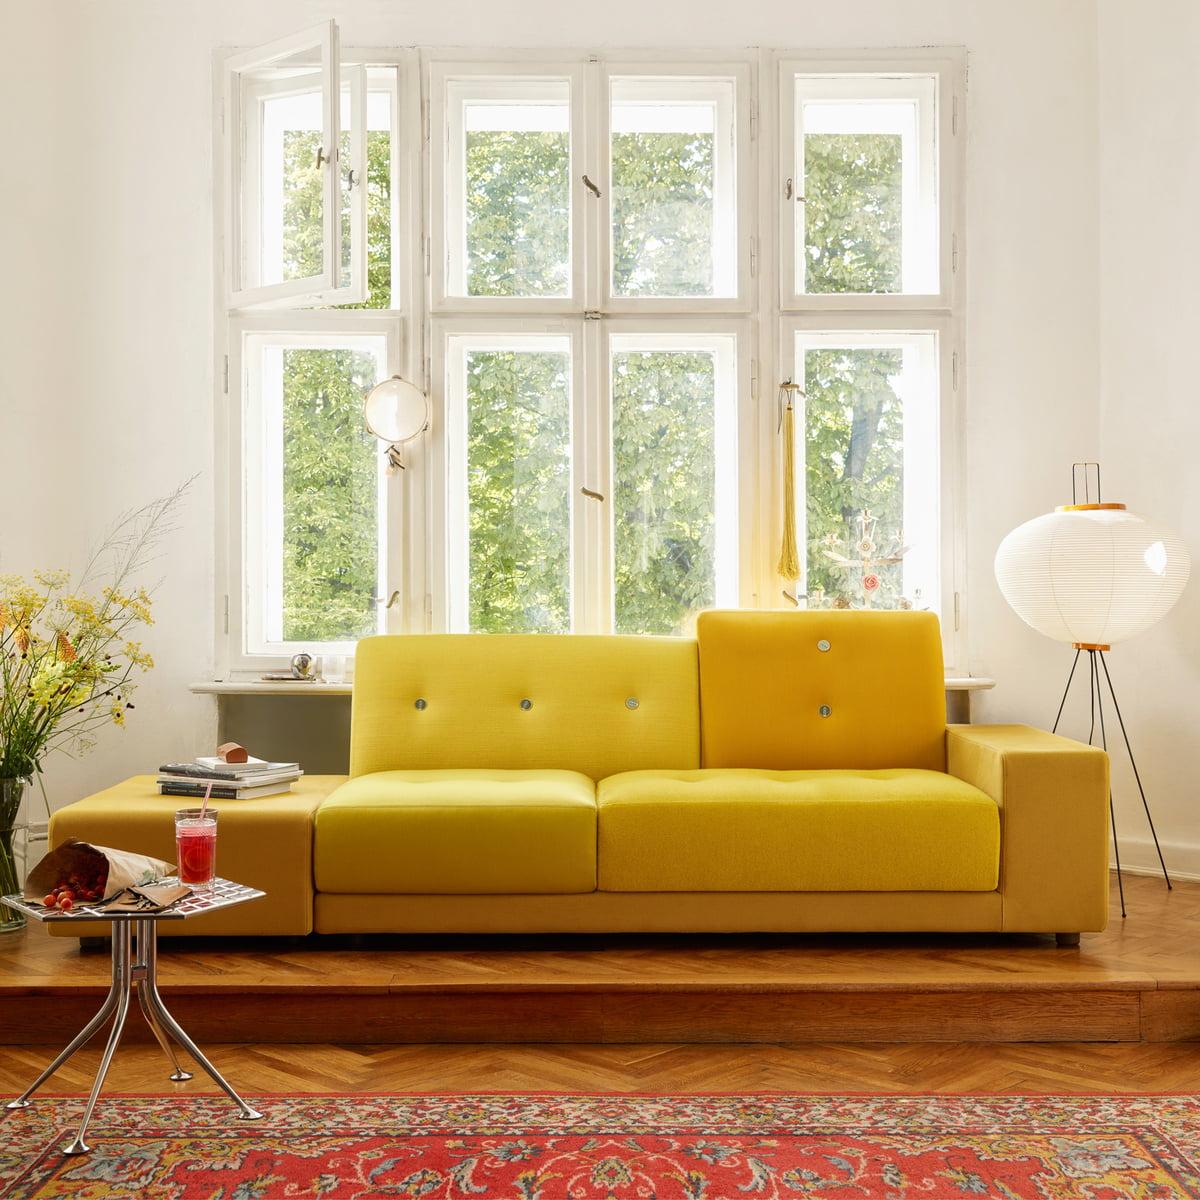 akari furniture. The Polder Sofa XL And Akari 10A Floor Lamp By Vitra Furniture H